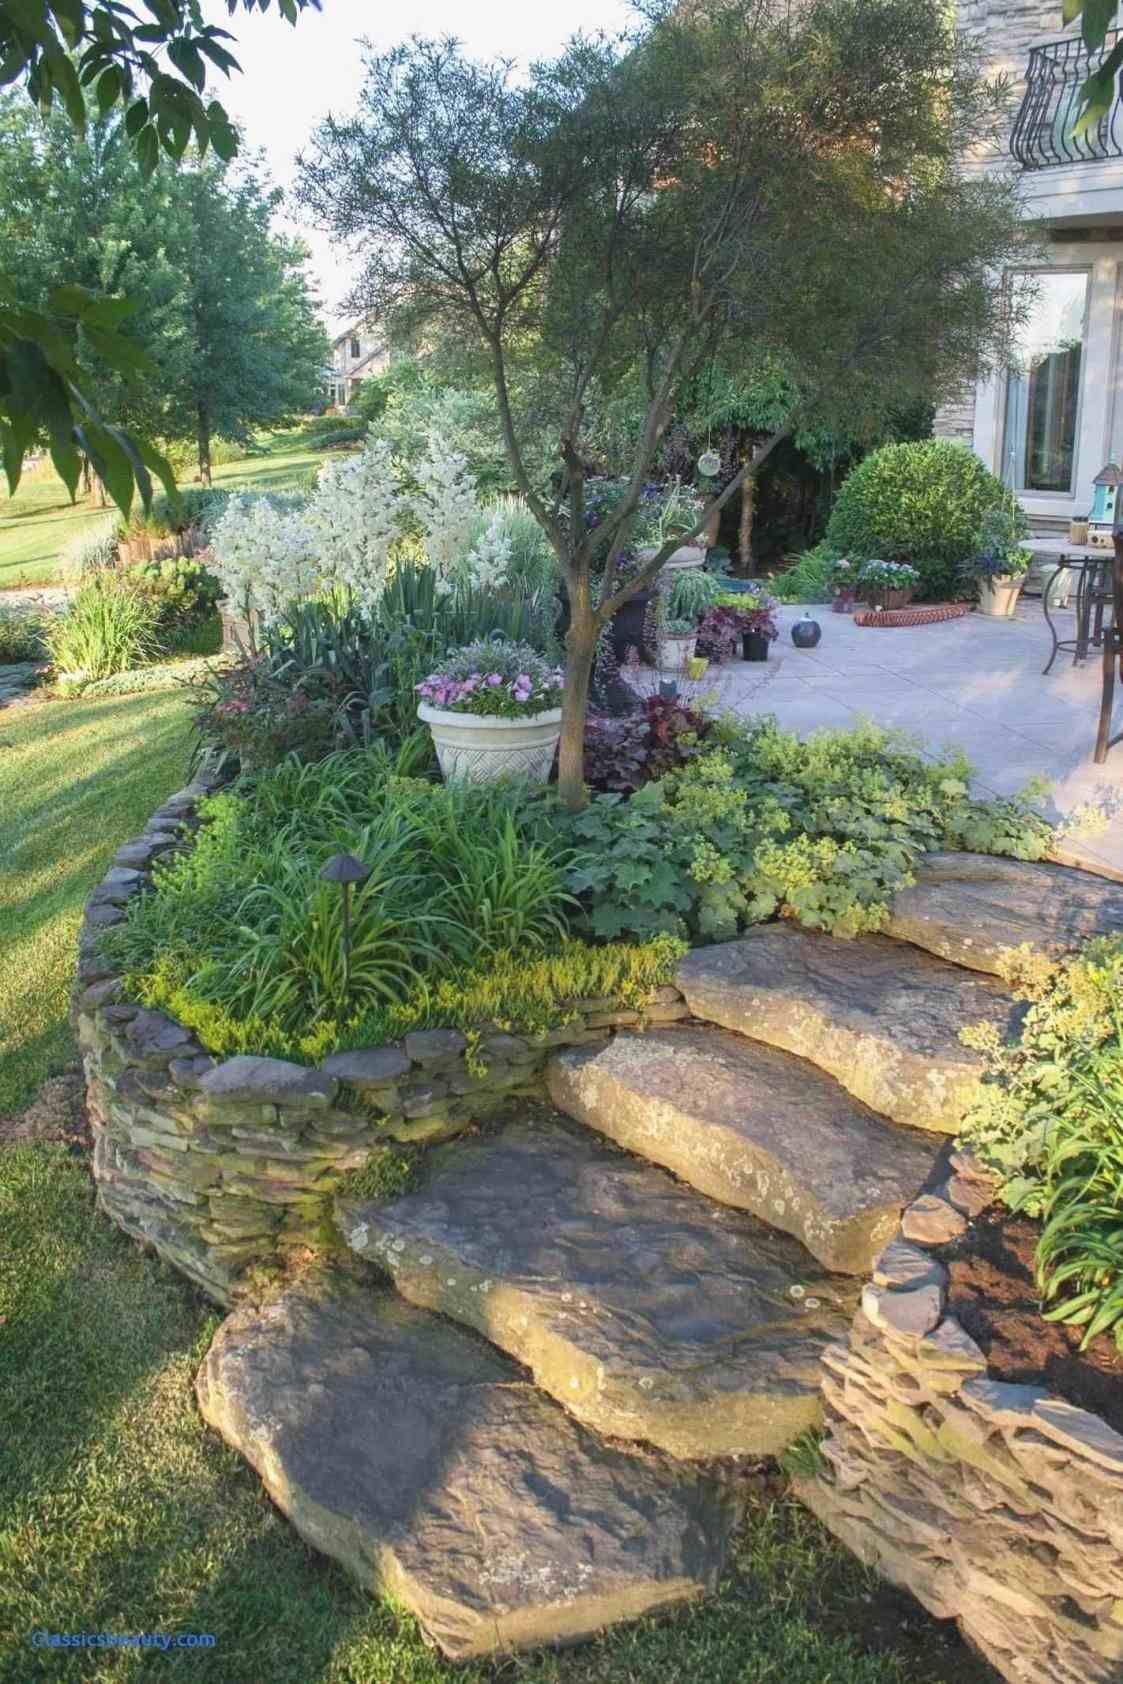 13 Genius Designs Of How To Make Landscape Ideas For Hilly Backyards Backyard Landscaping Backyard Garden Steps